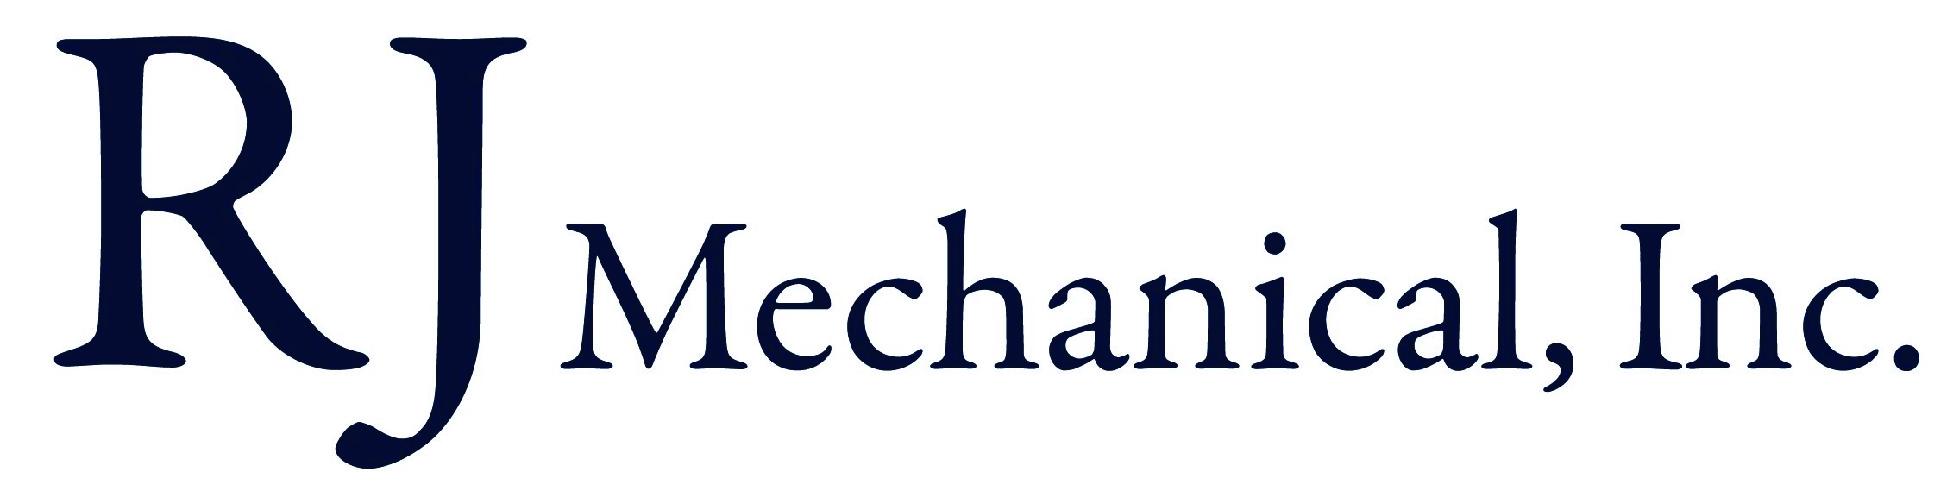 RJ Mechanical.jpg